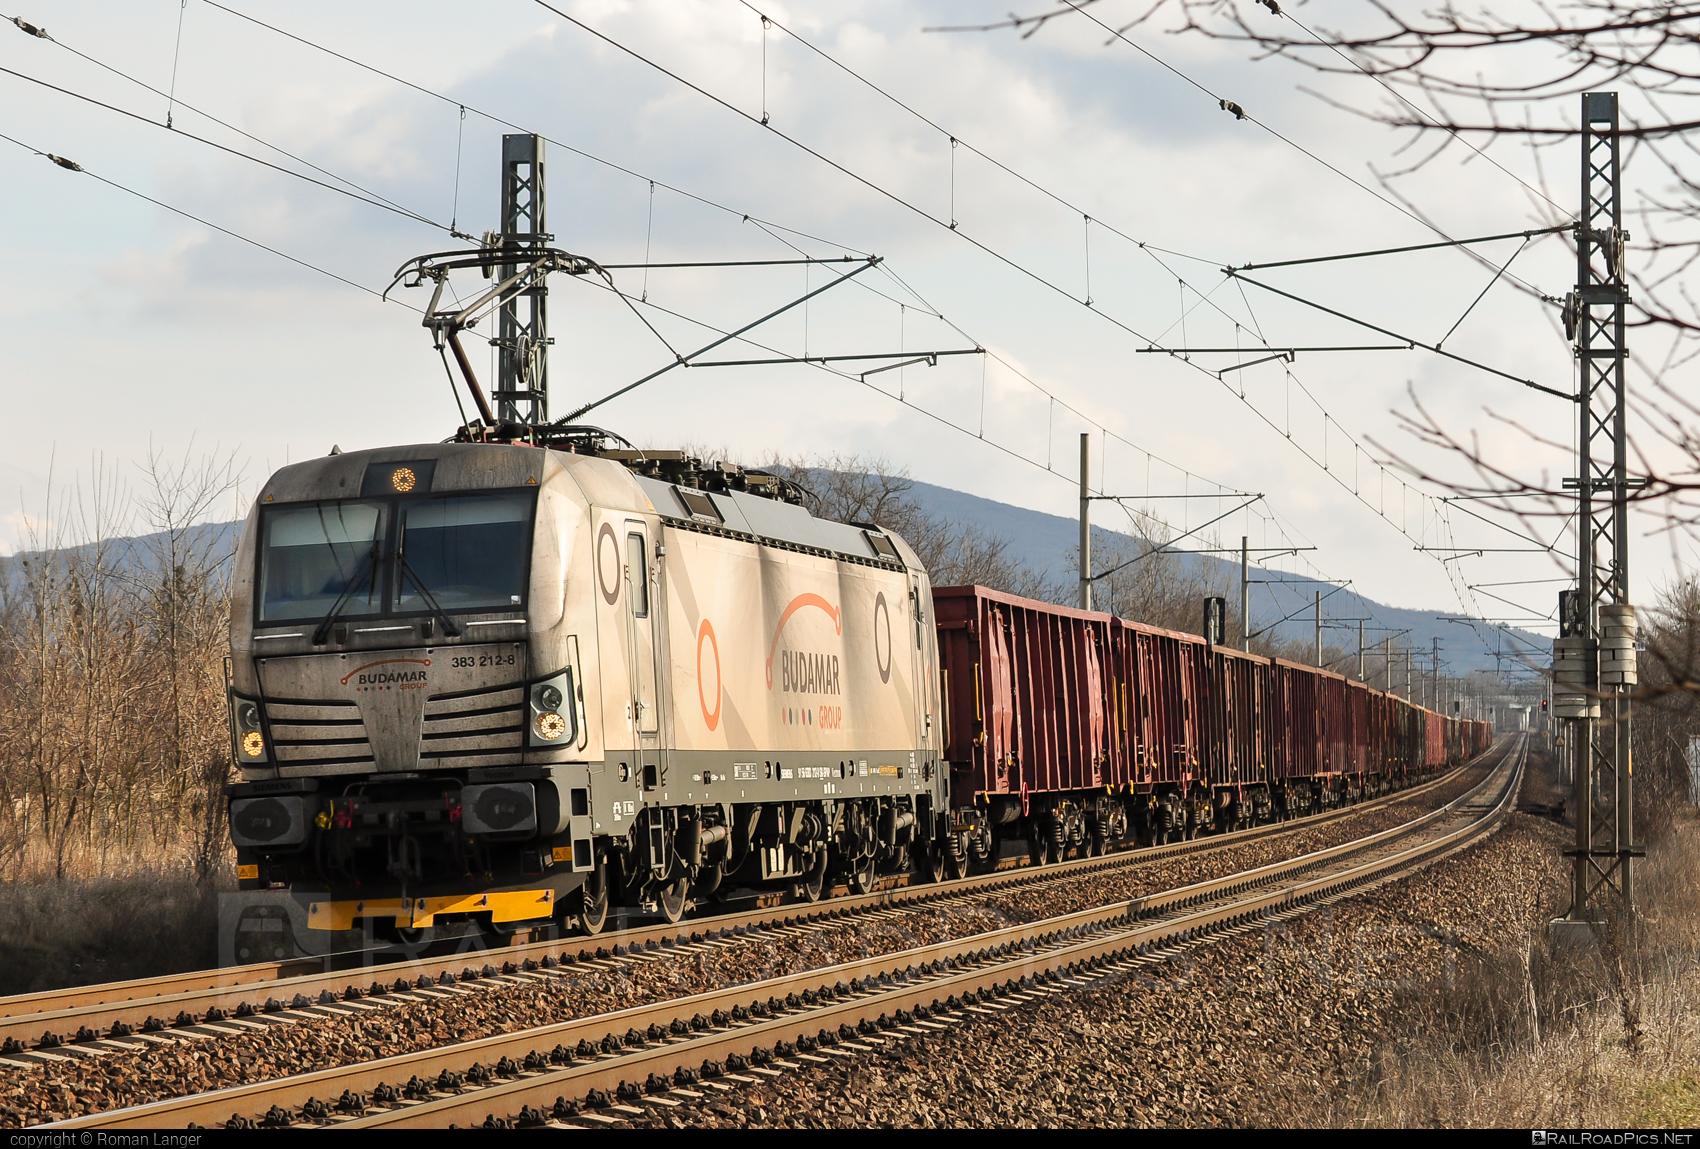 Siemens Vectron MS - 383 212-8 operated by LOKORAIL, a.s. #budamar #lokorail #lrl #siemens #siemensvectron #siemensvectronms #slovenskaplavbaapristavy #slovenskaplavbaapristavyas #spap #vectron #vectronms